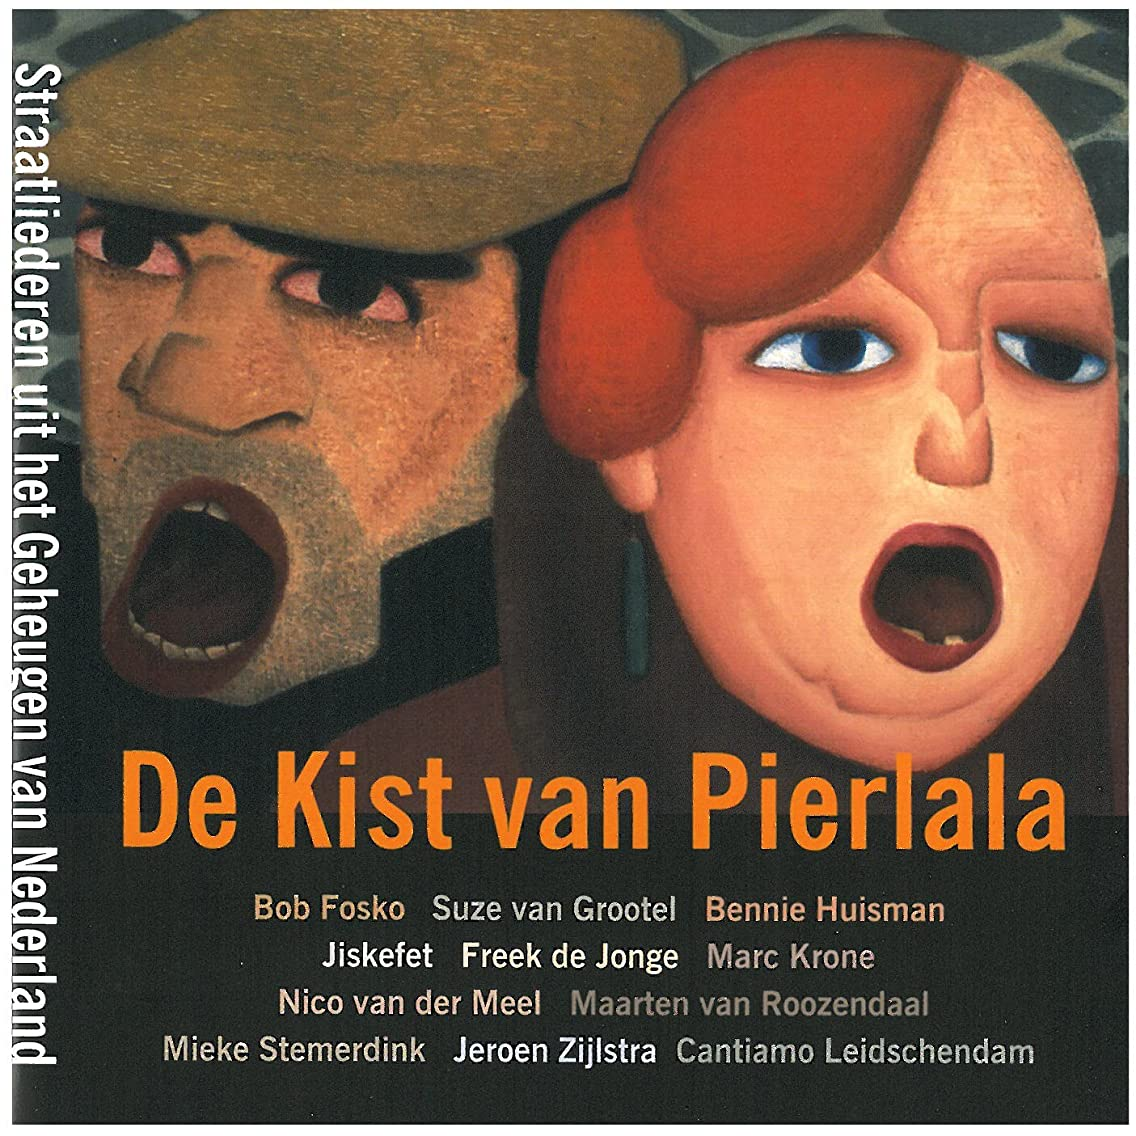 De Kist van Pierlala -- Street songs from the Netherlands